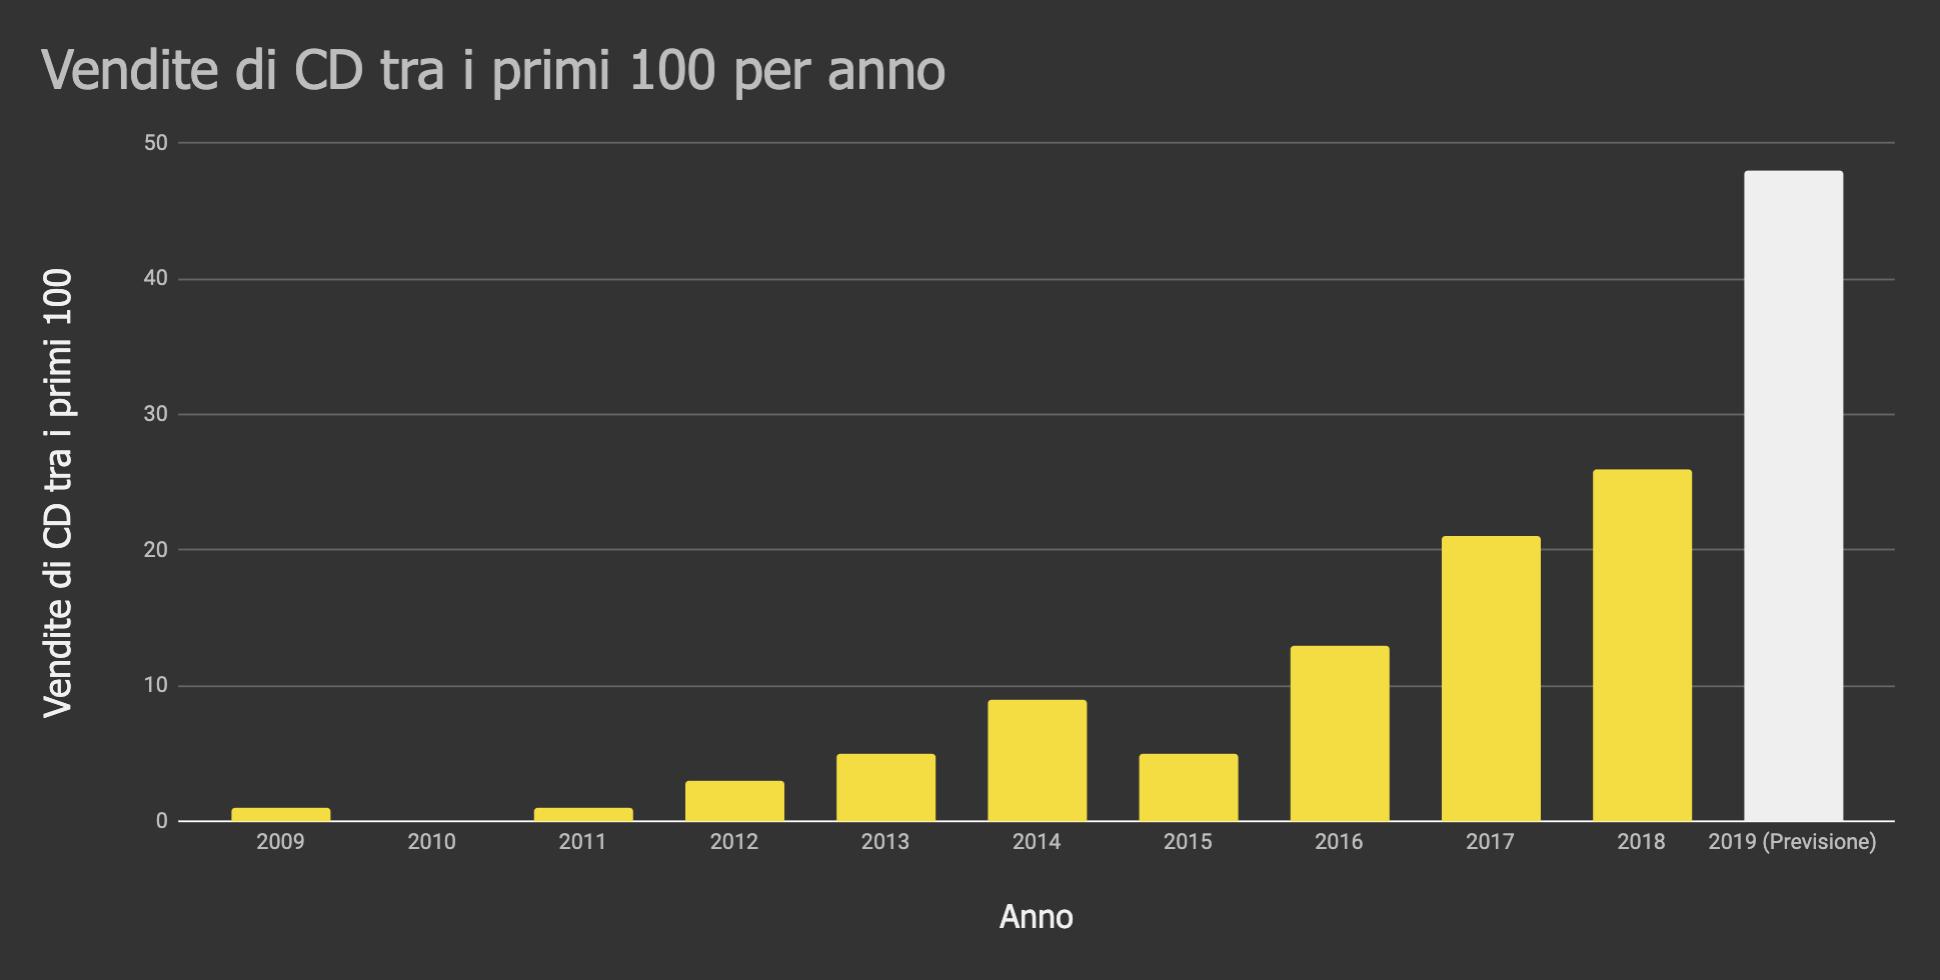 Vendite di CD tra i primi 100 per anno